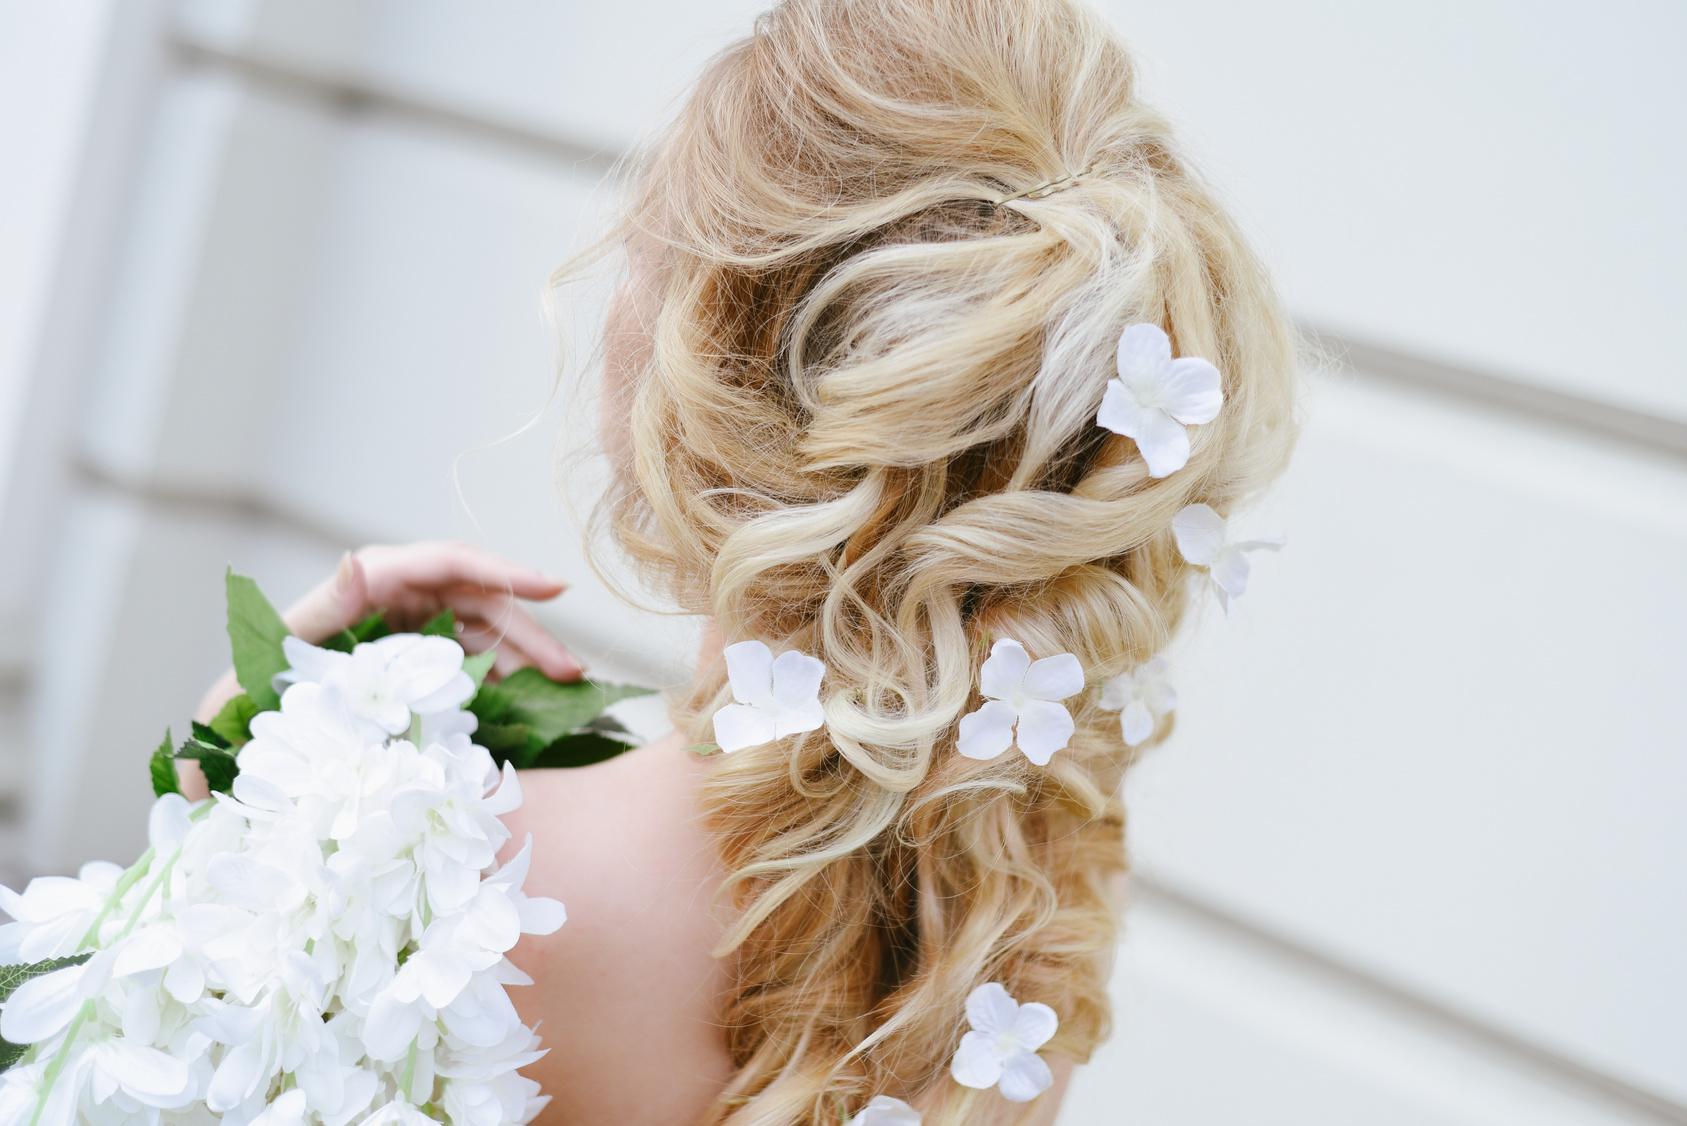 fryzura ślubna Panny Młodej